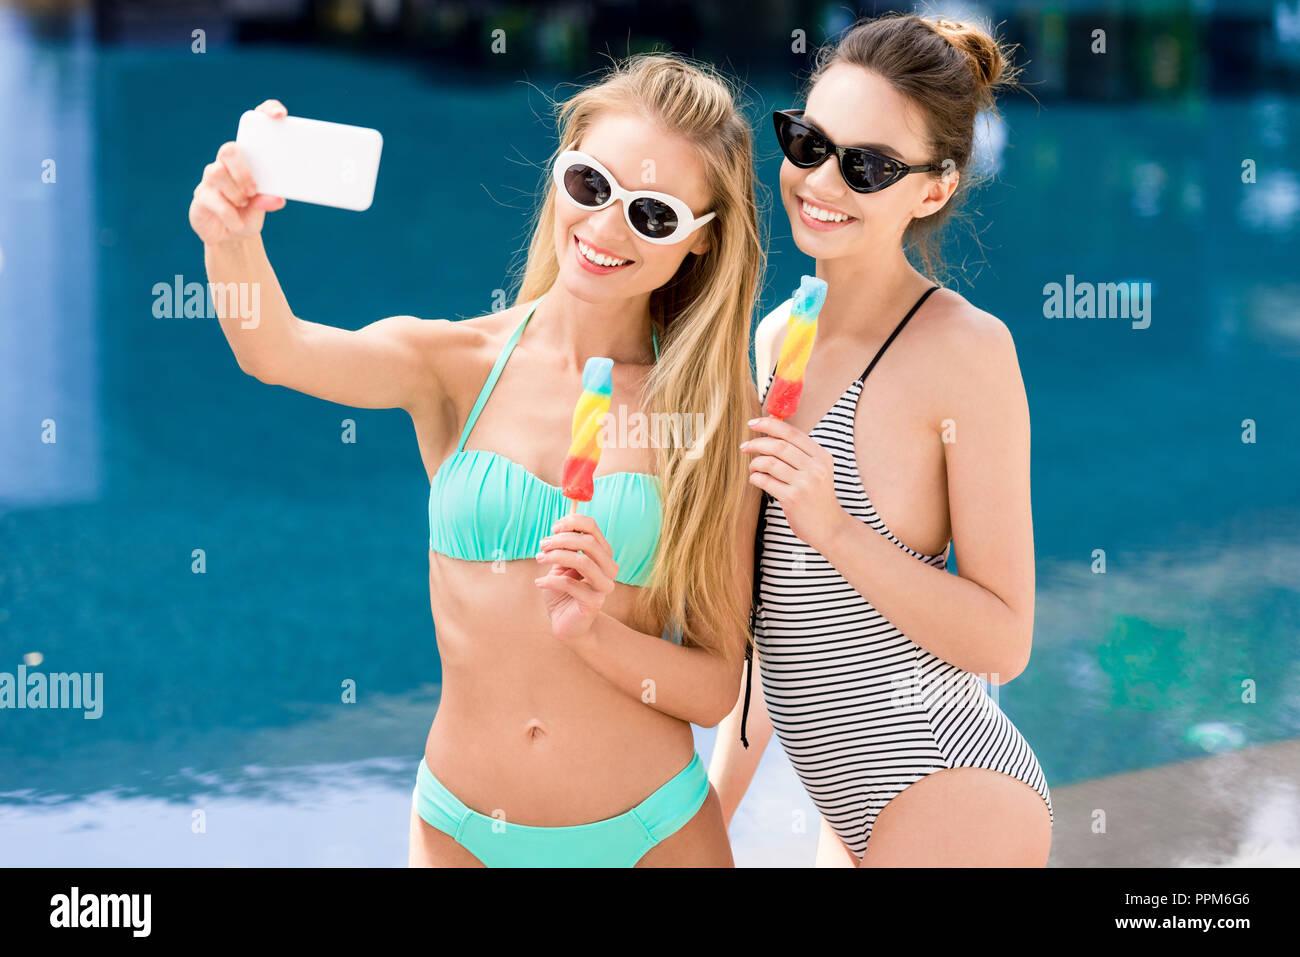 Selfie Stockamp; Alamy Imágenes De Bikini Fotos PwOkZuiXT